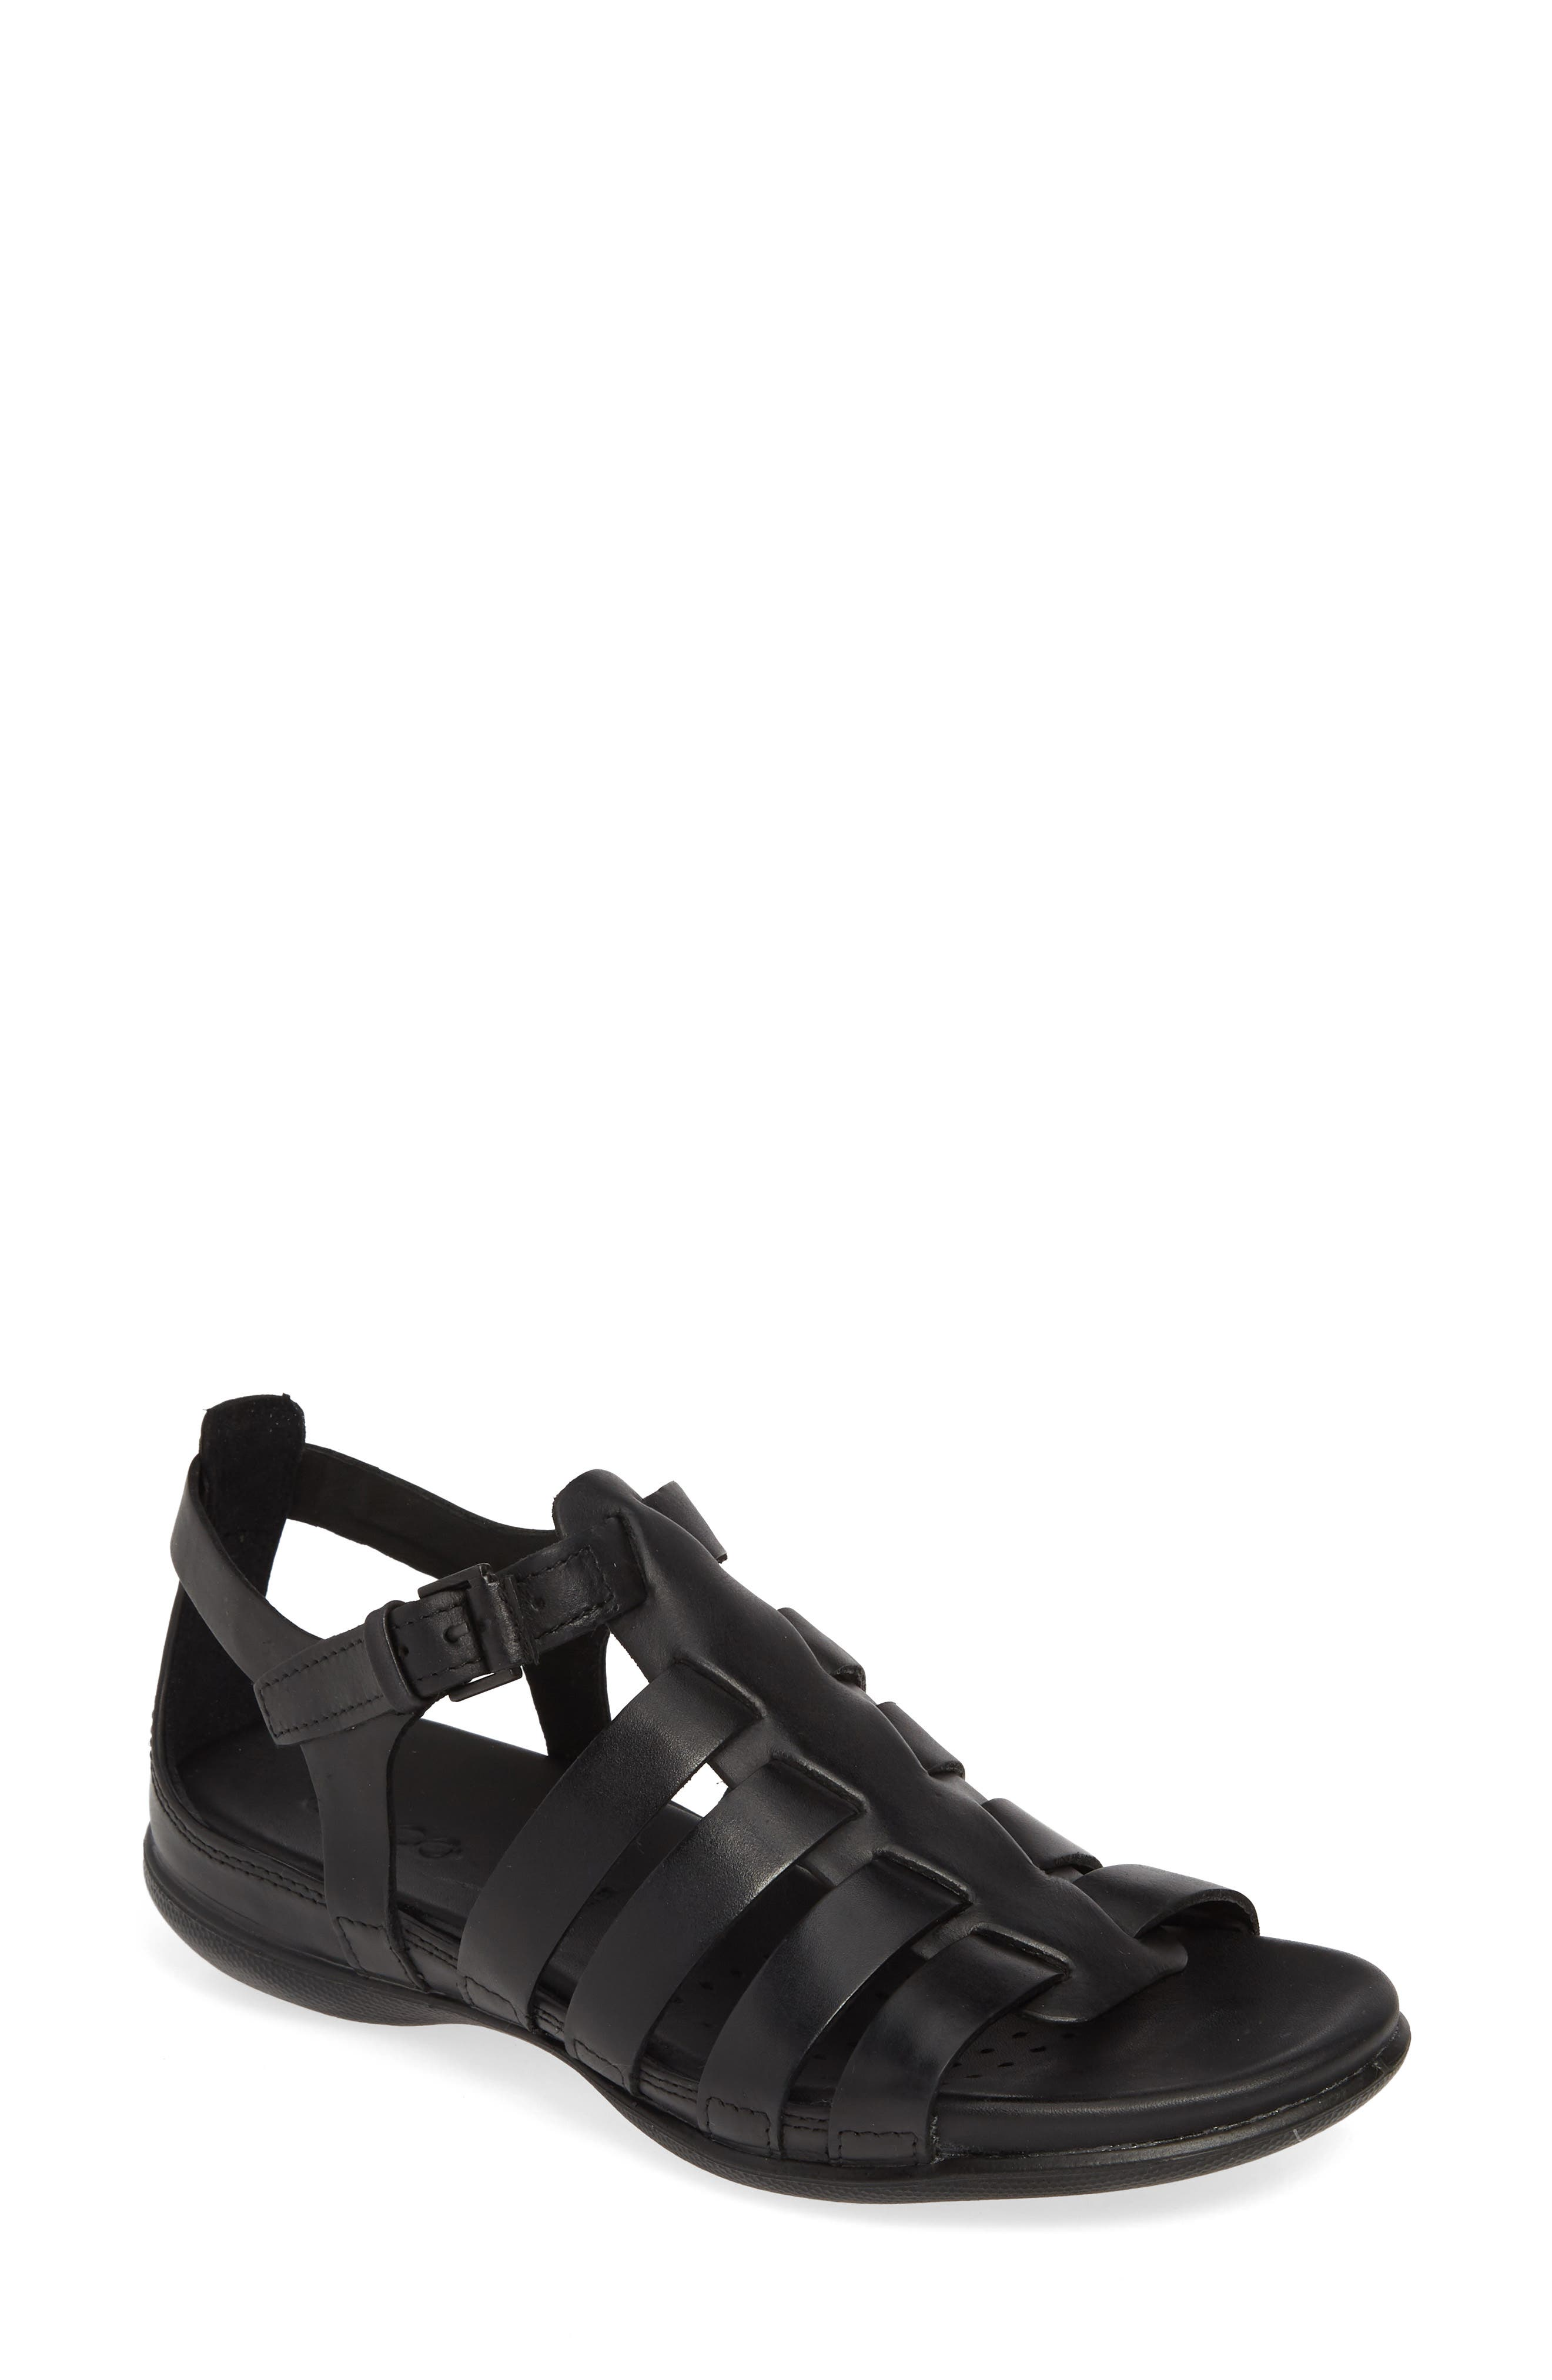 UPC 809704938738 product image for Women's Ecco Flash Strappy Sandal, Size 10-10.5US / 41EU - Black | upcitemdb.com